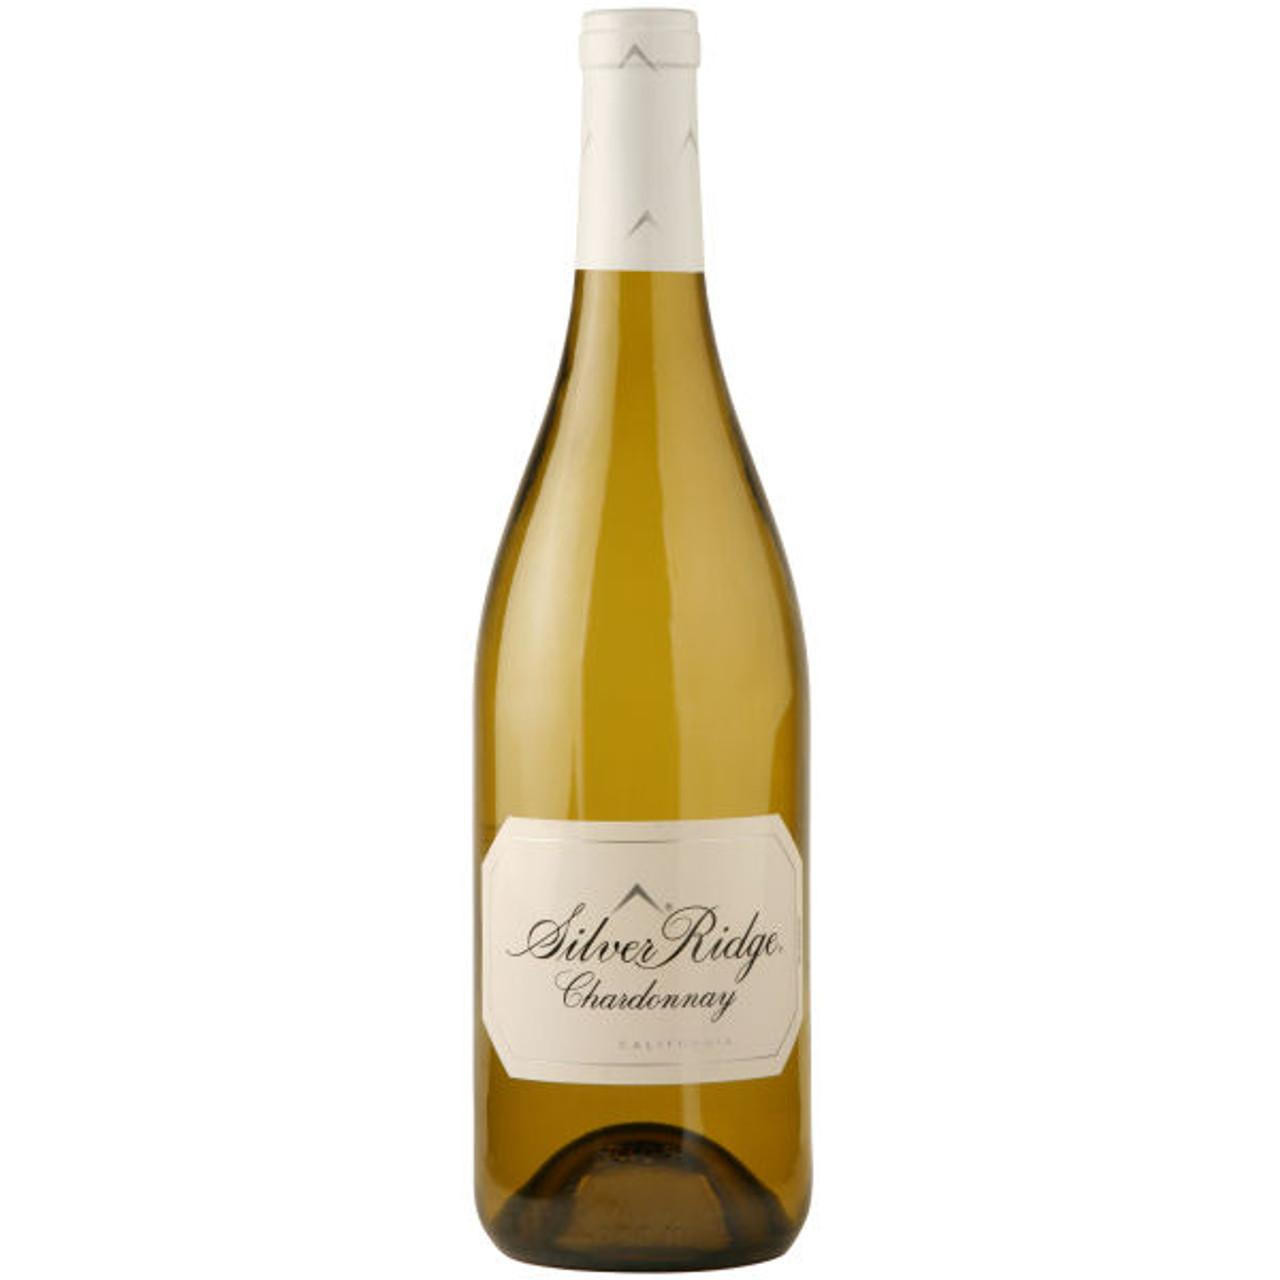 Silver Ridge California Chardonnay